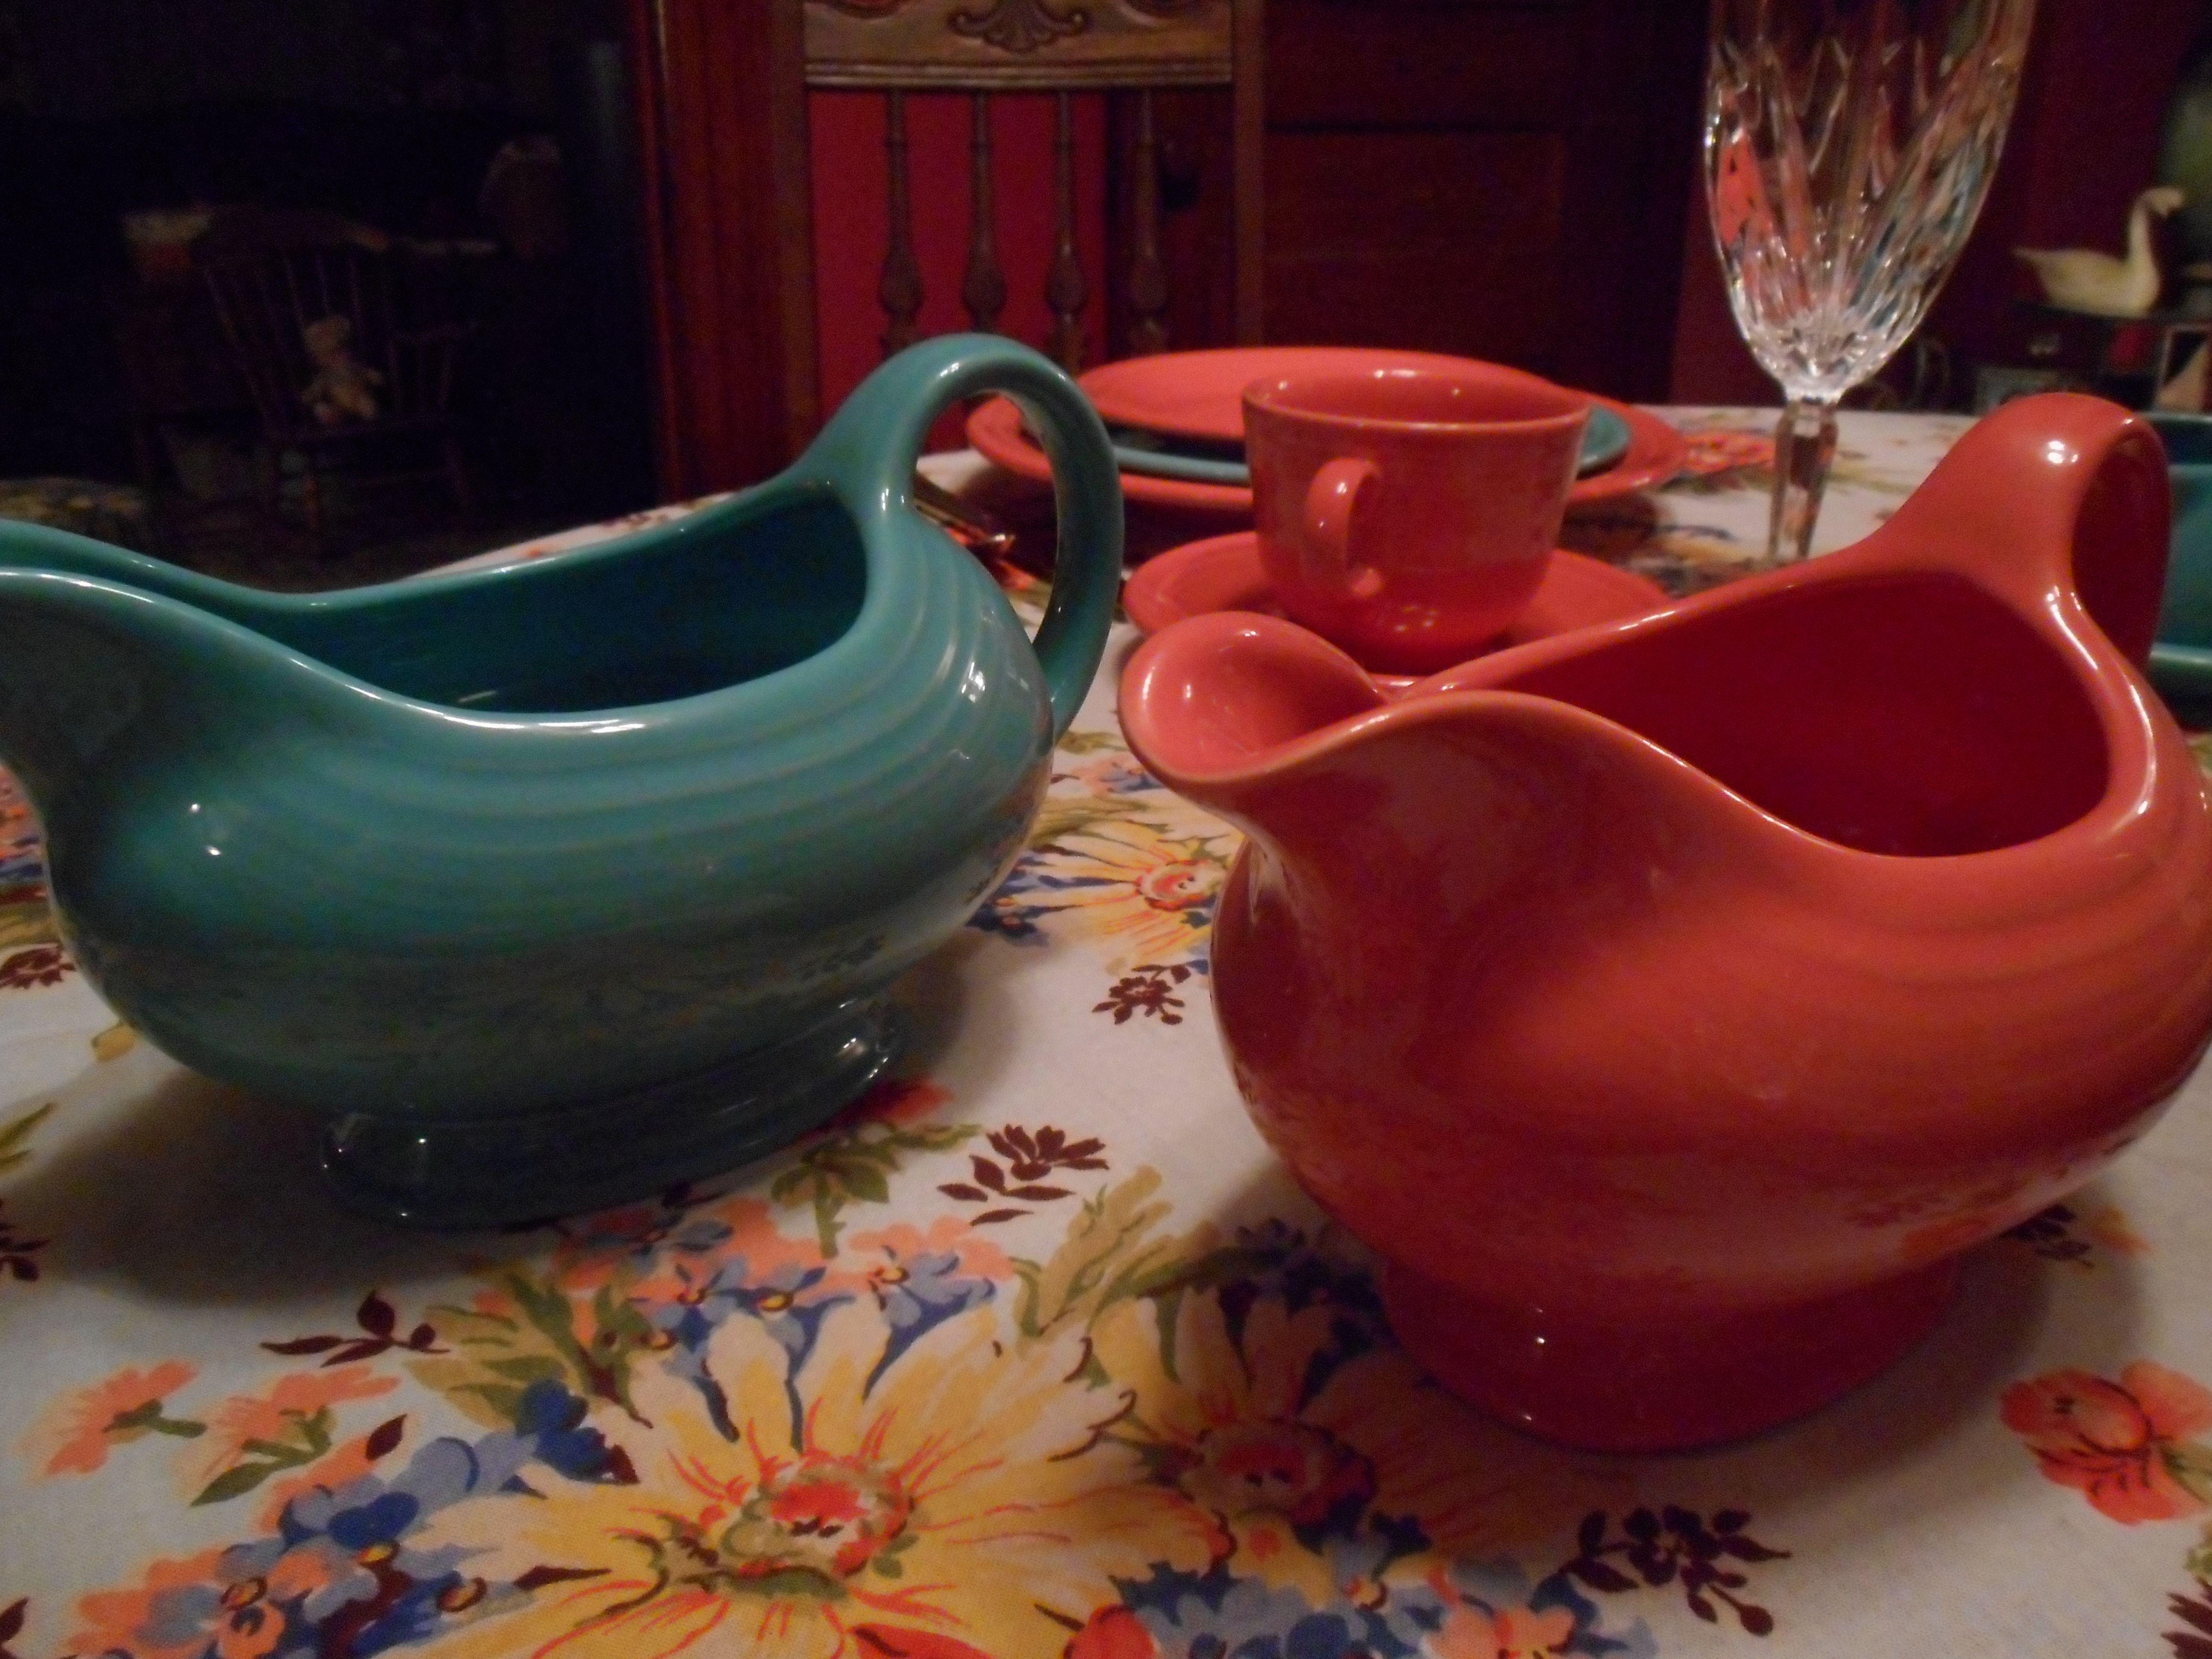 turquoise and flamingo gravy boats & turquoise and flamingo gravy boats   My Fiesta Dinnerware ...